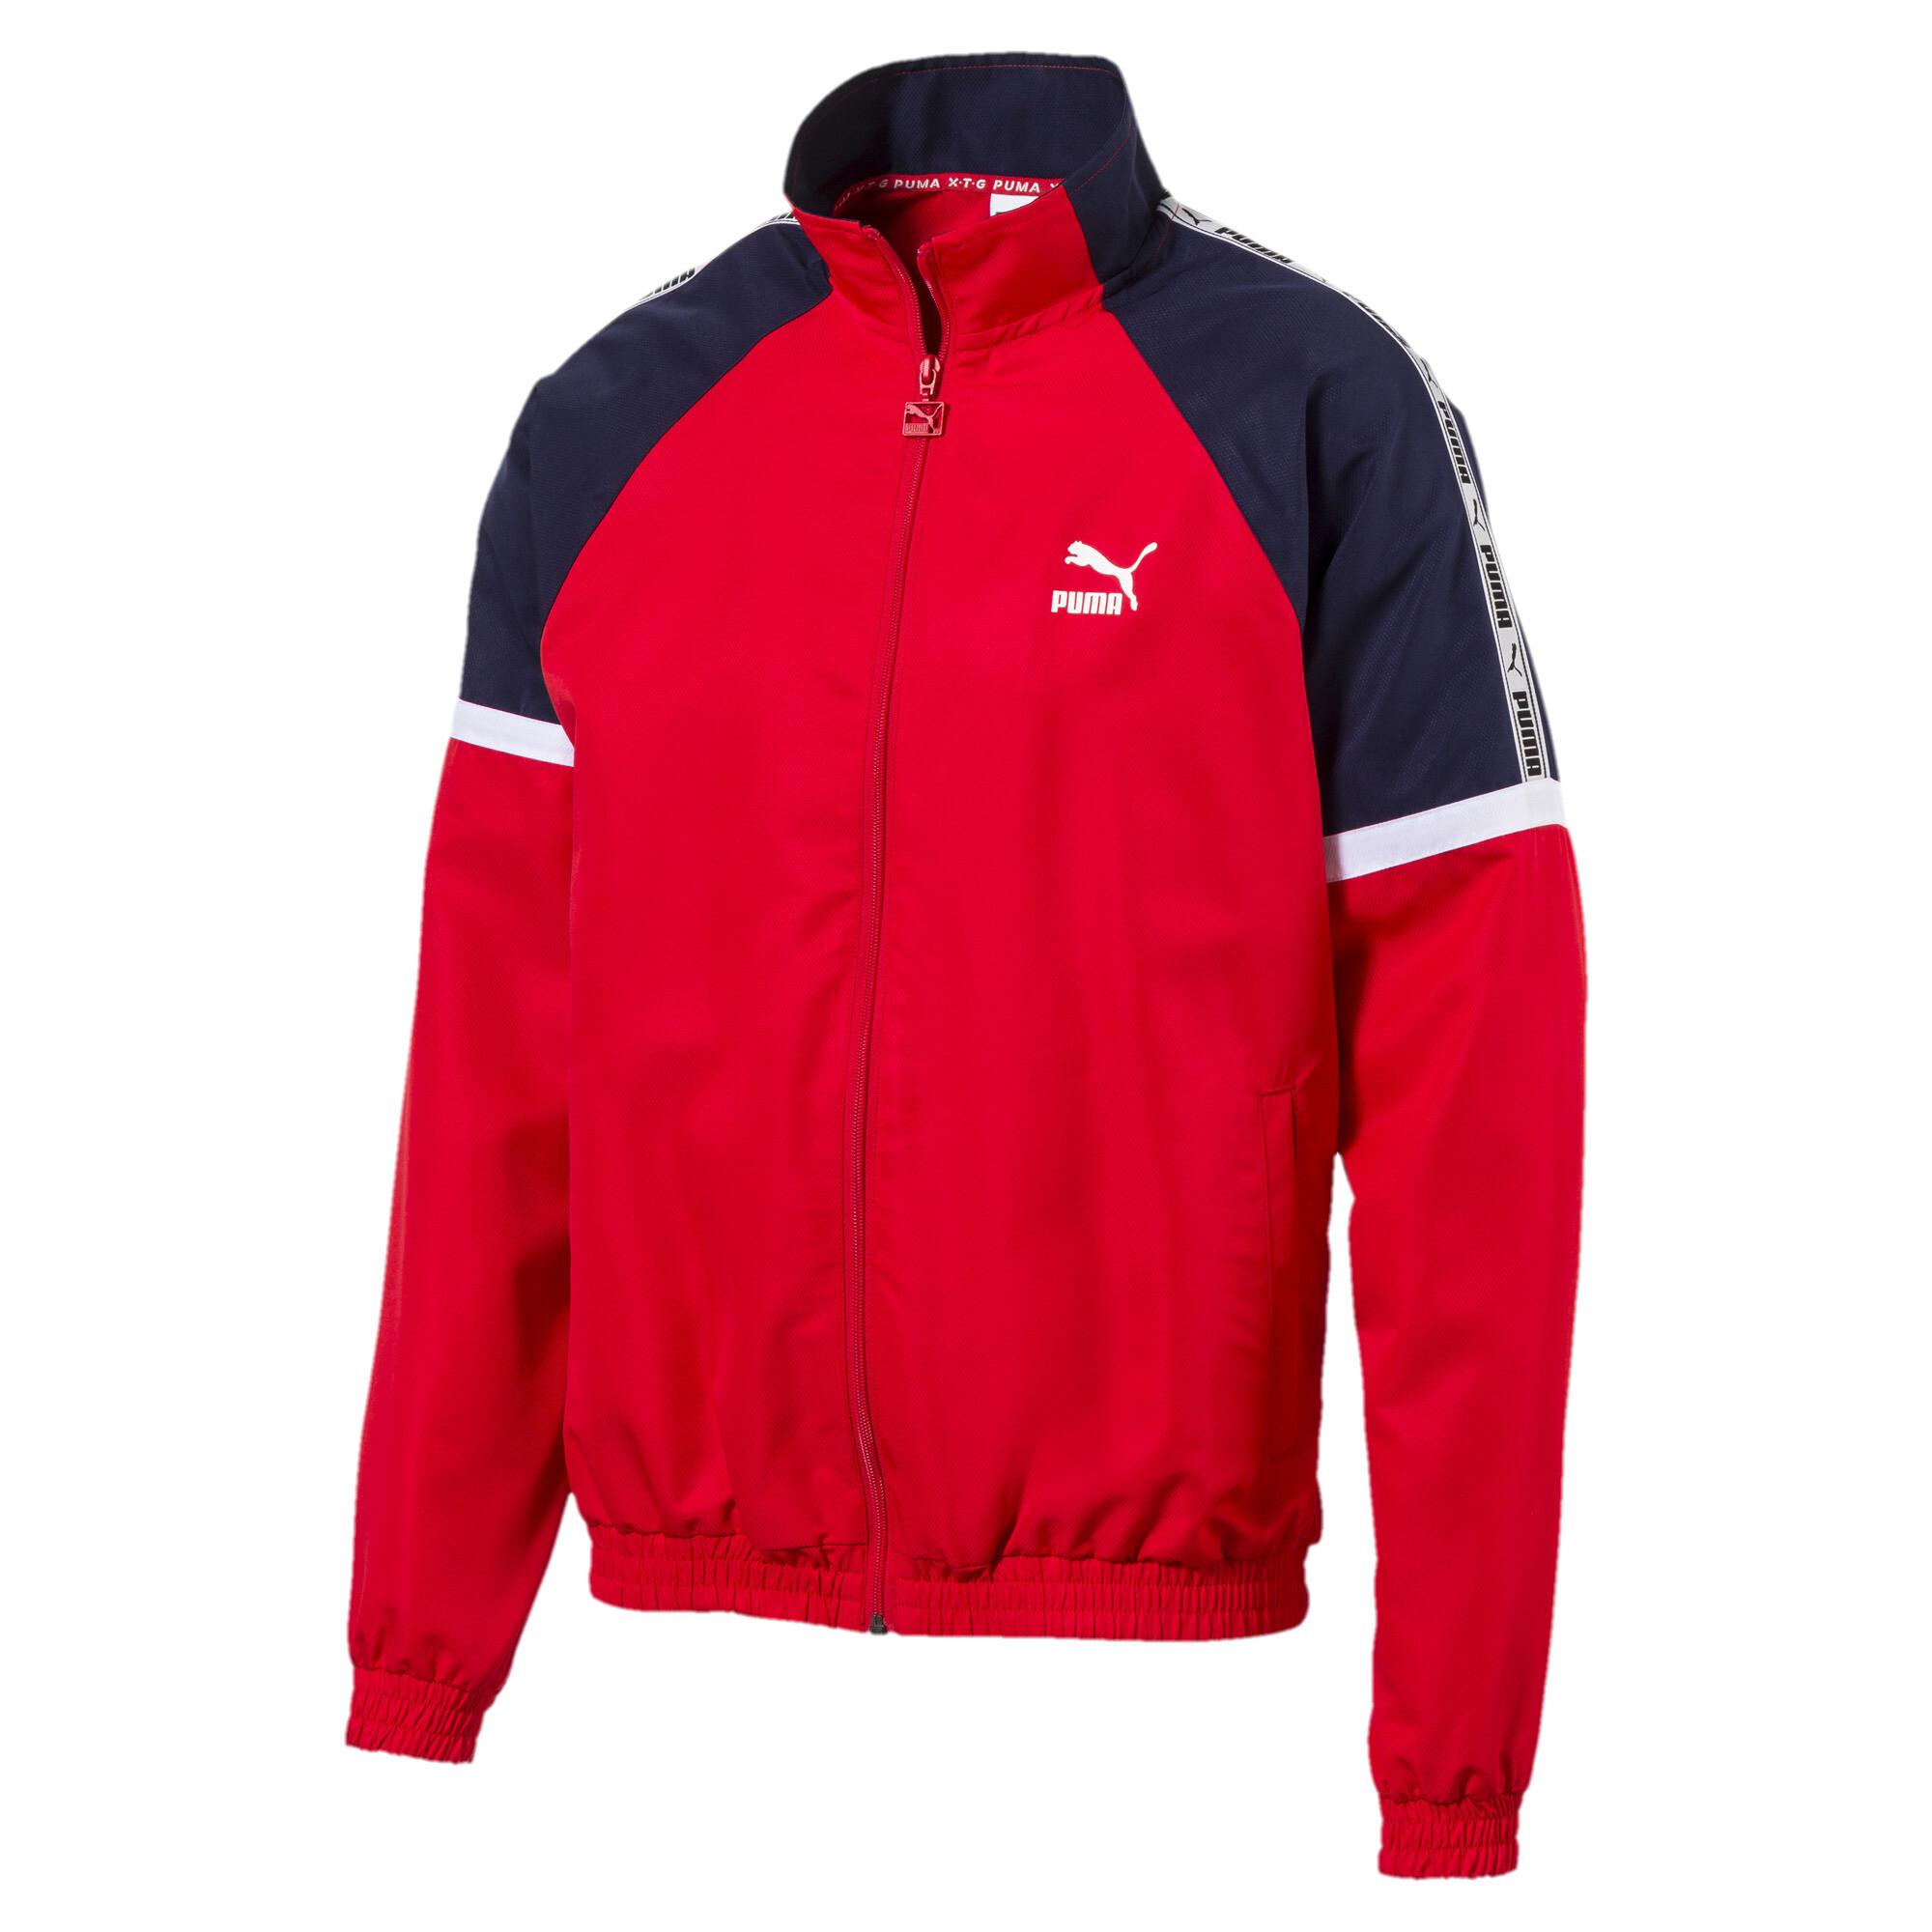 Image Puma XTG Woven Men's Jacket #4